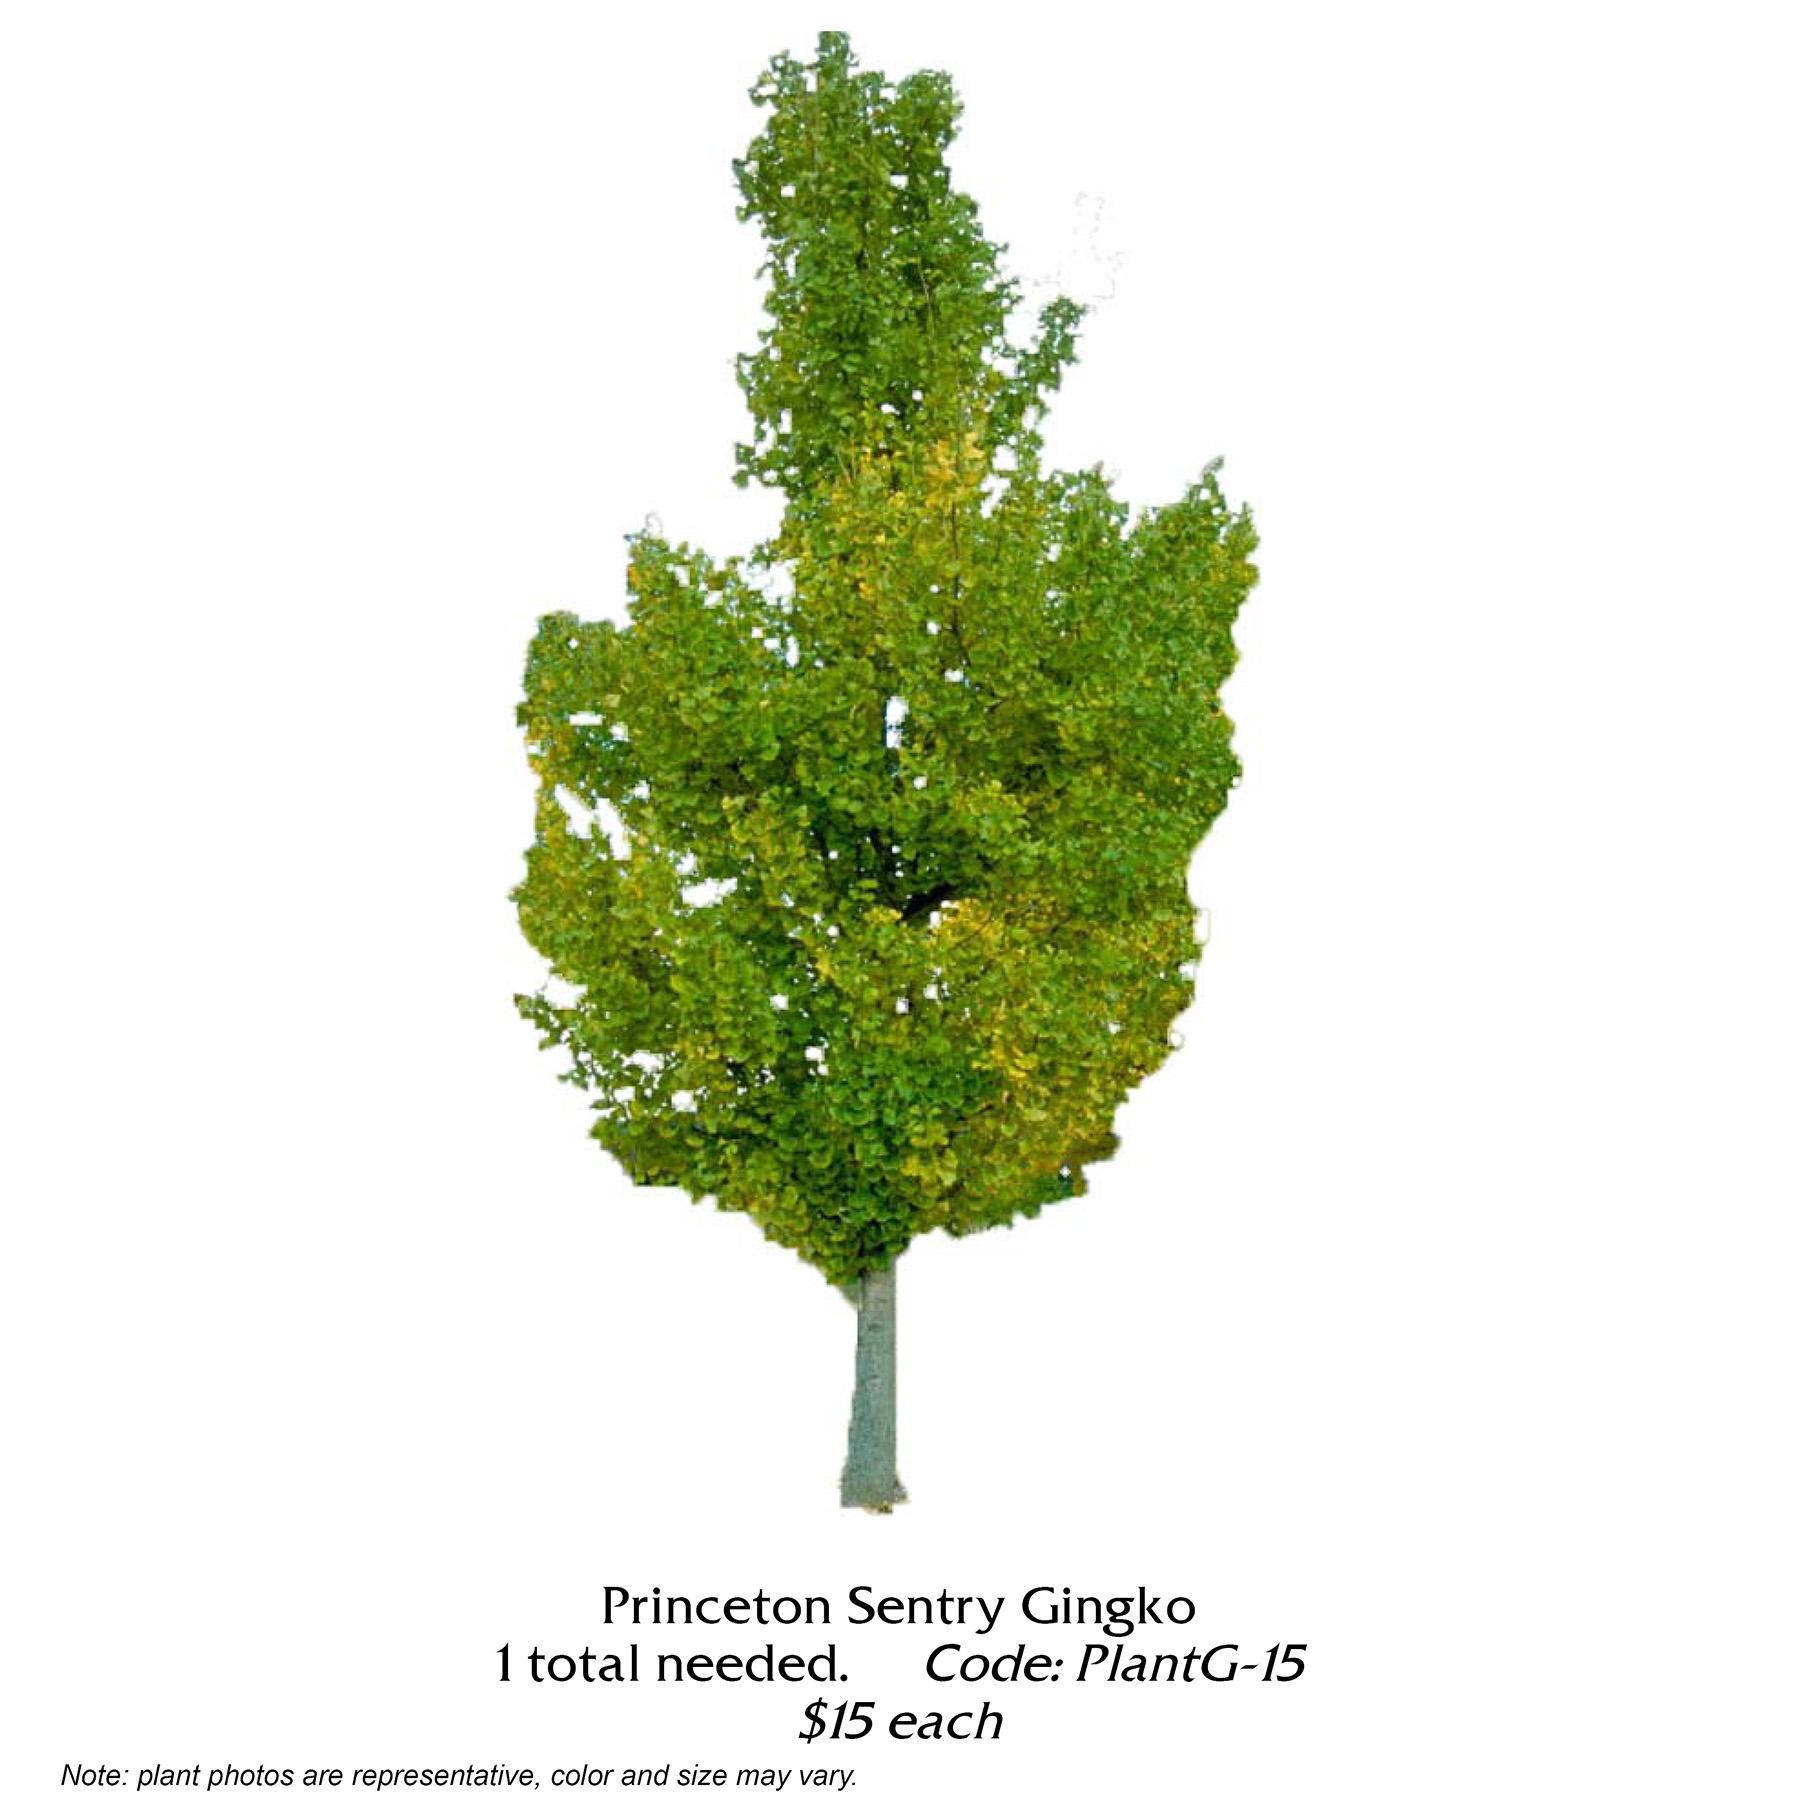 Princeton Sentry Gingko Tree.jpg